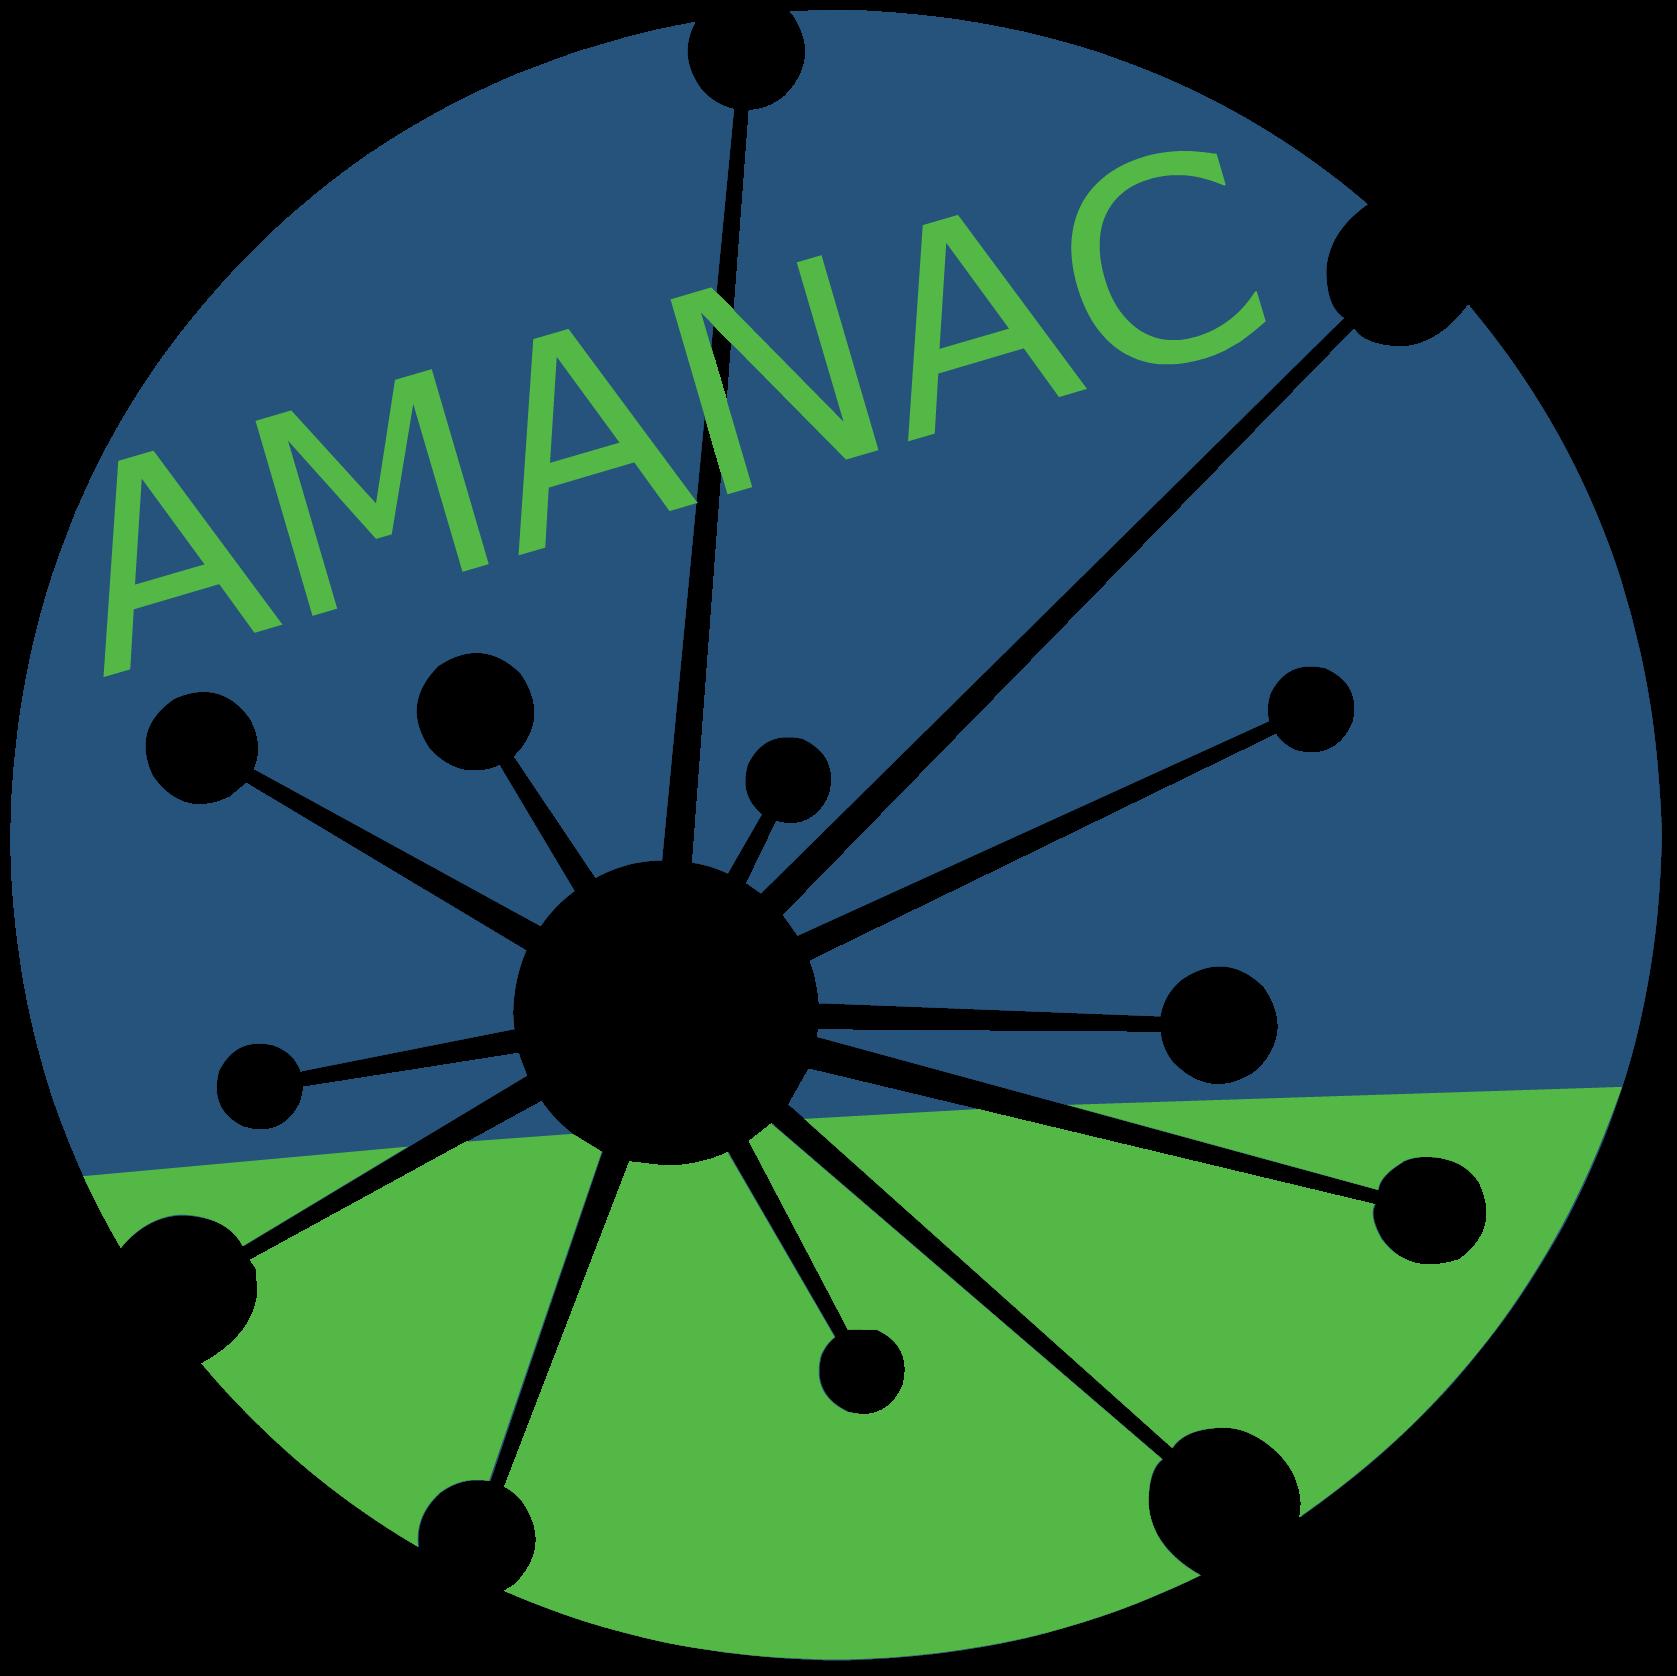 amanac project